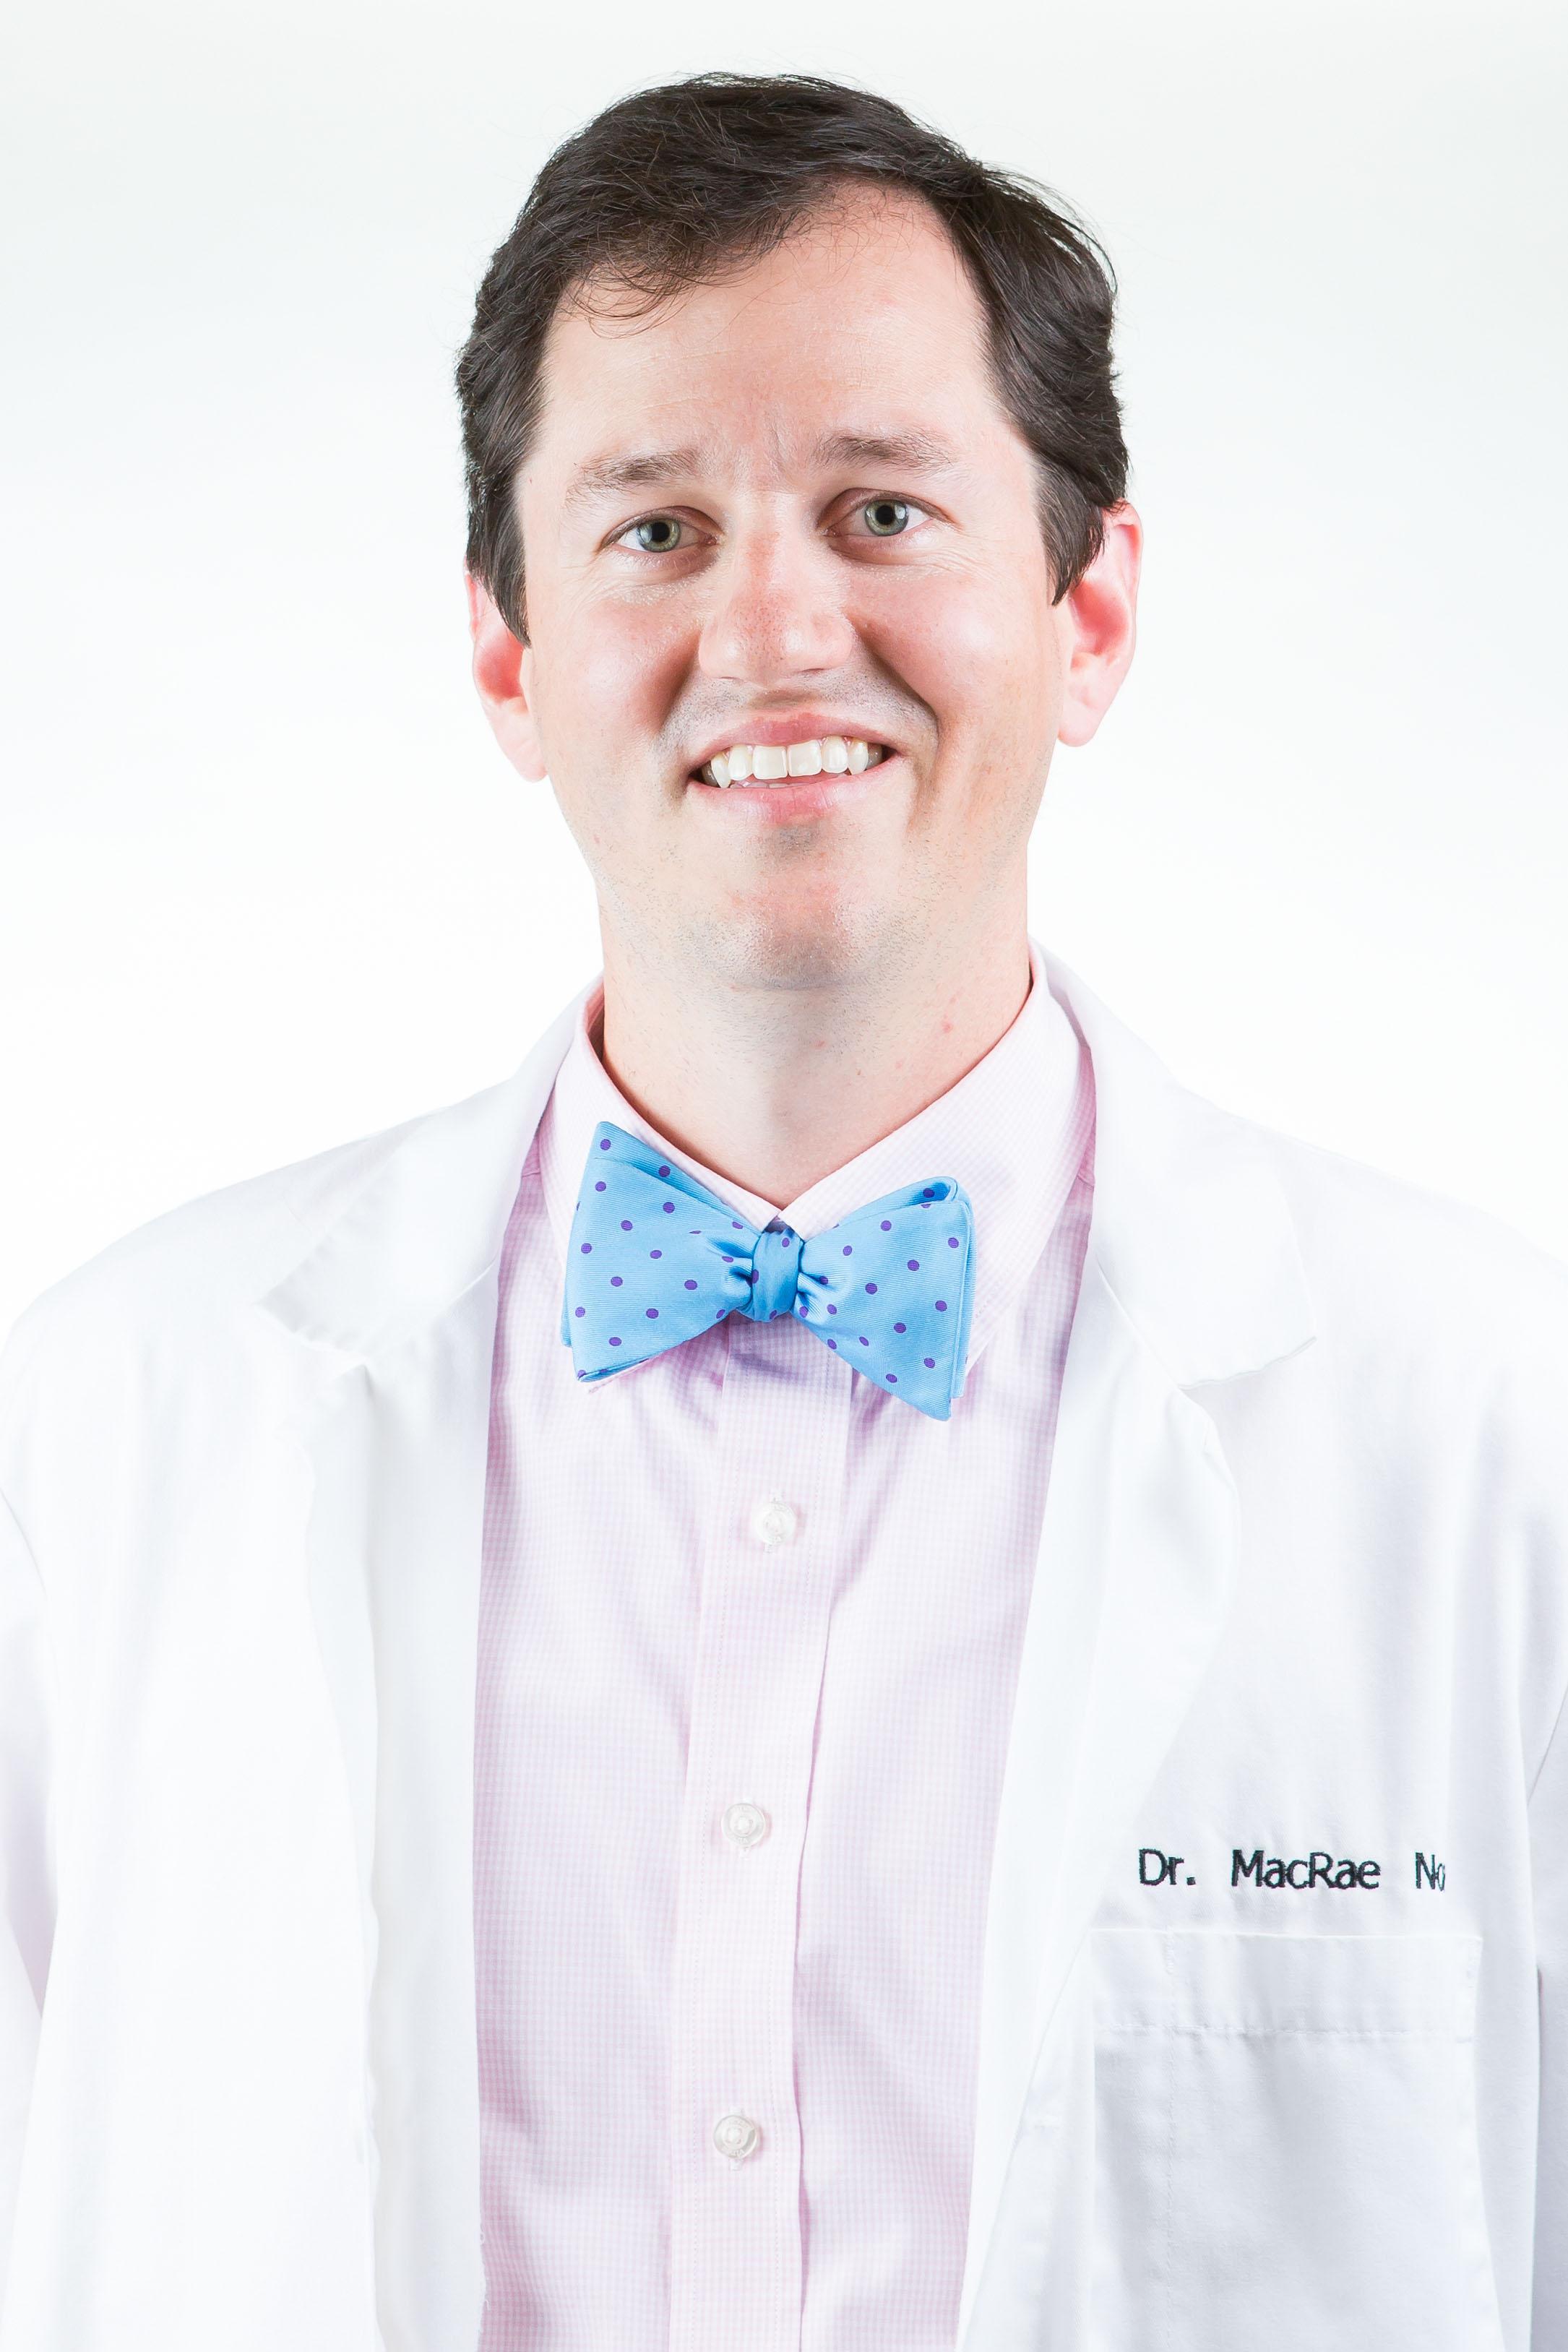 Dr. Cameron Noah